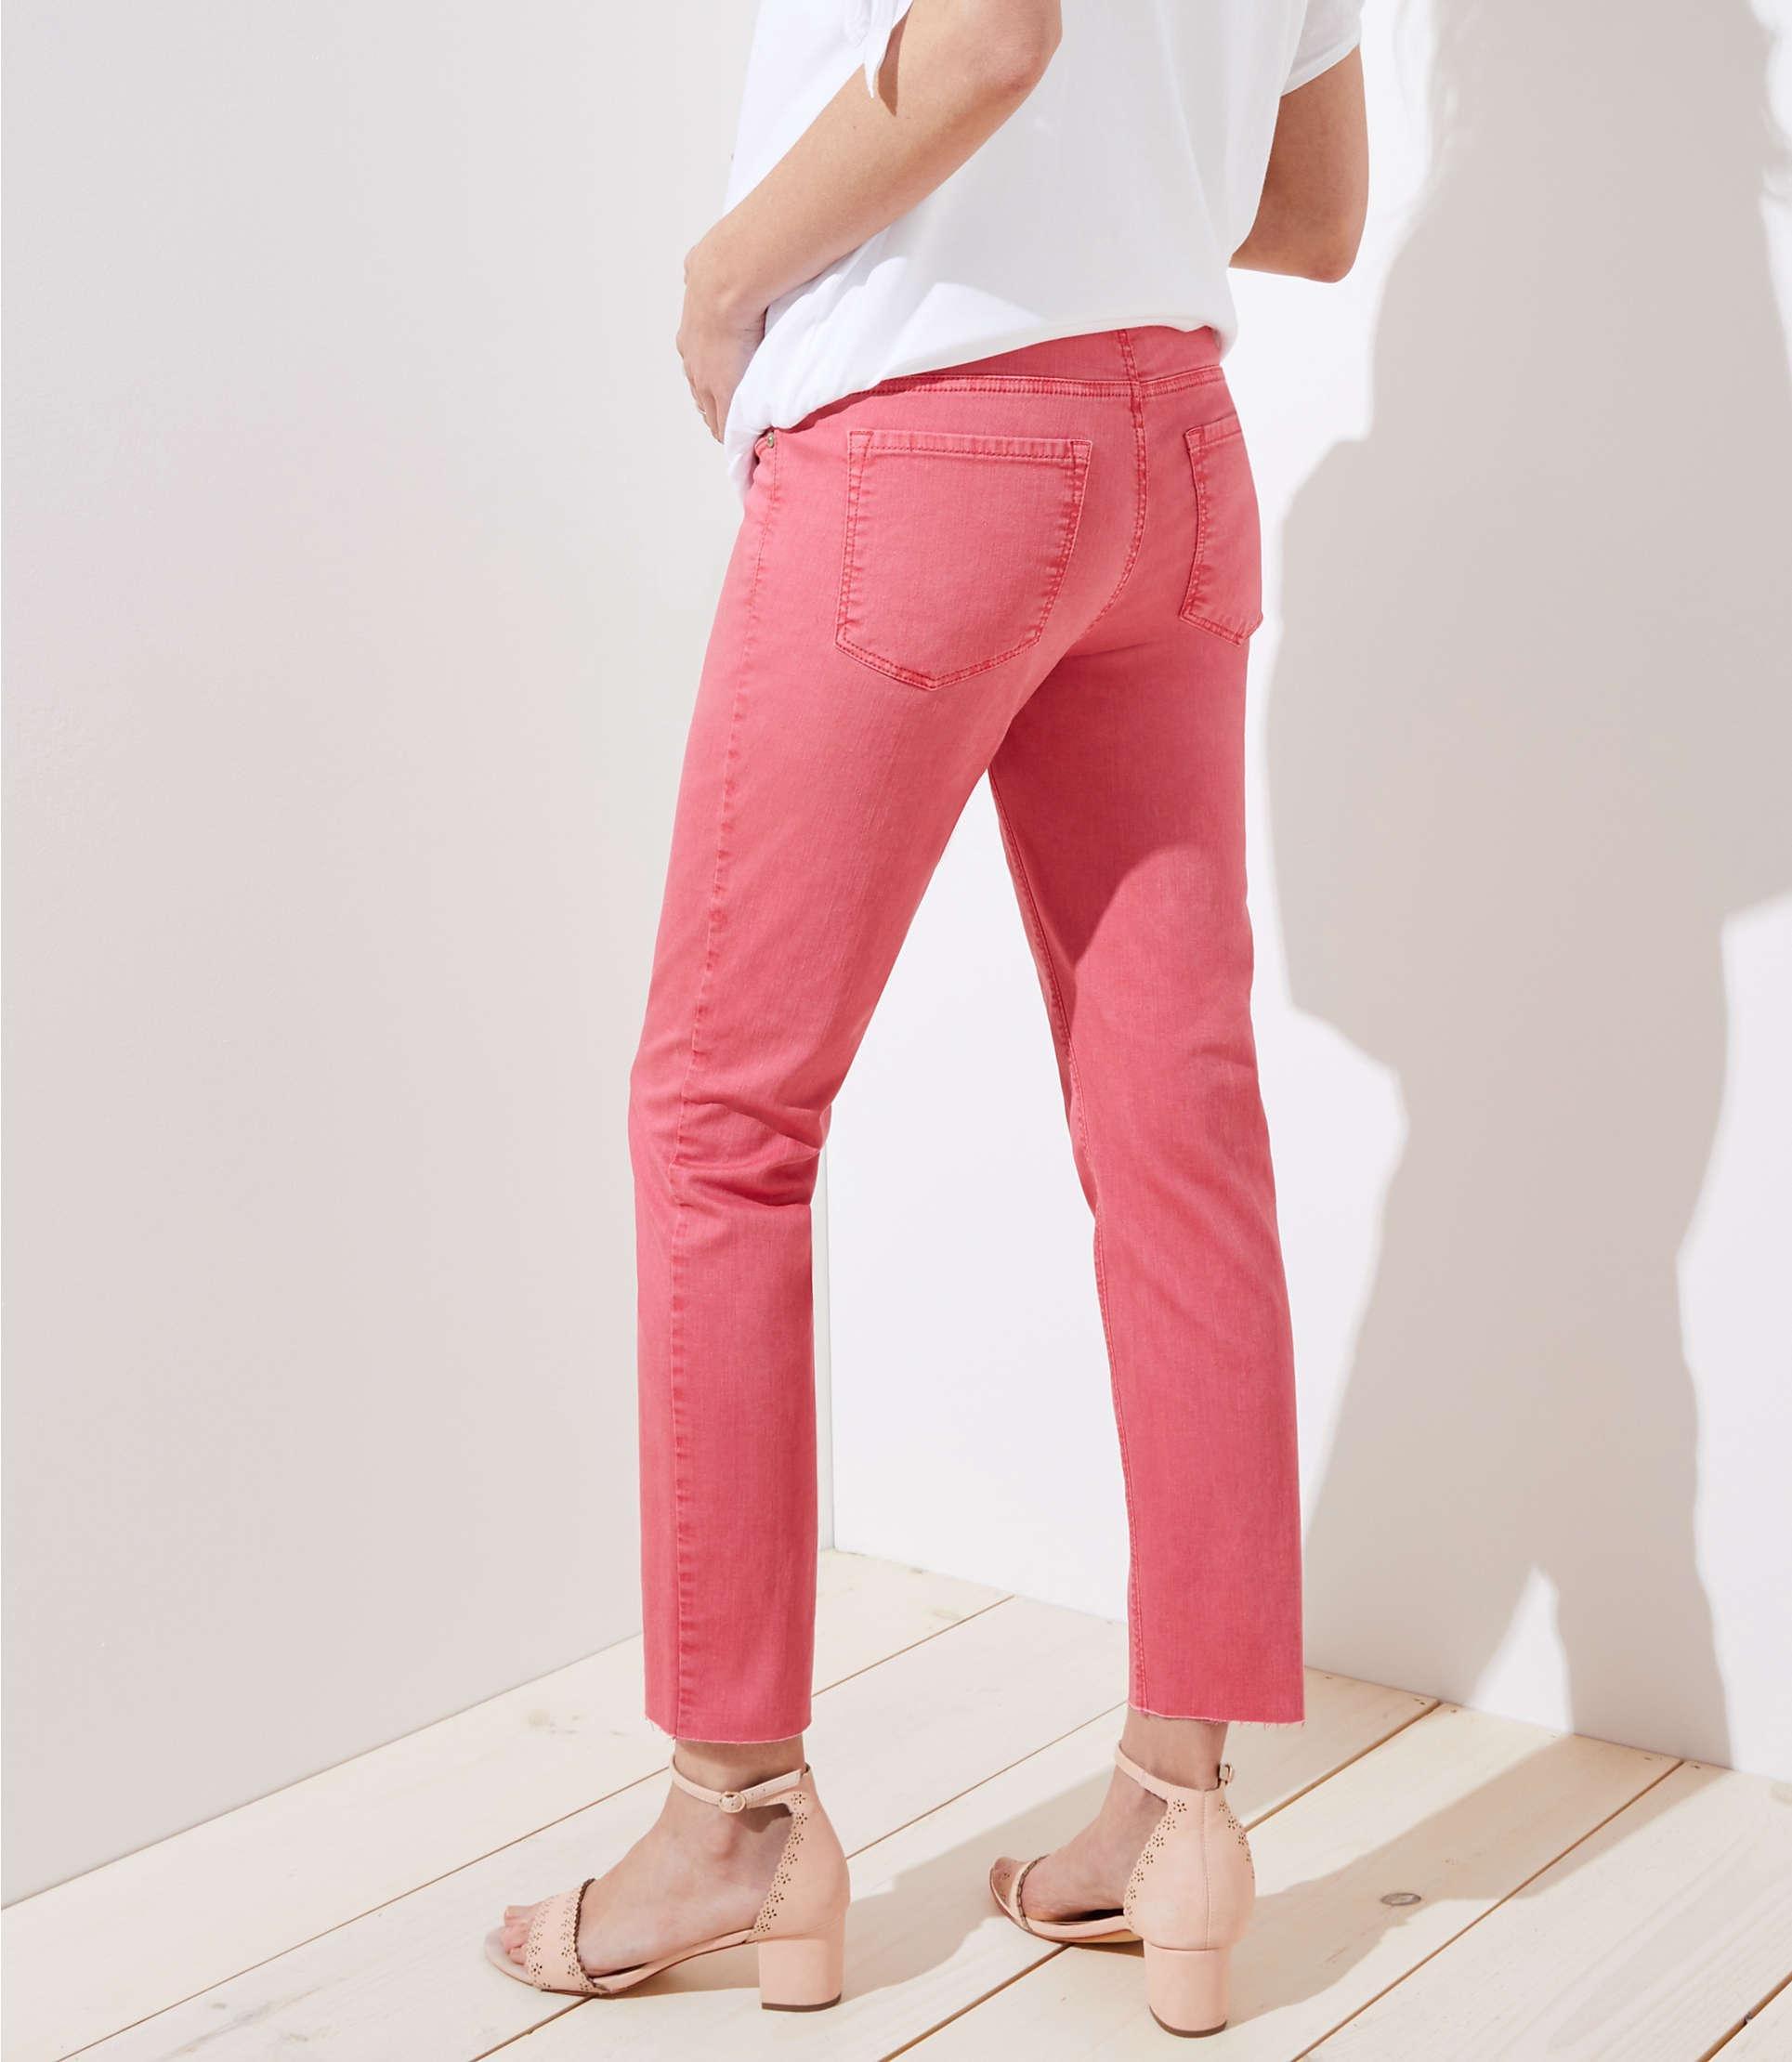 LOFT Denim Maternity Fresh Cut Skinny Crop Jeans In Passion Fruit